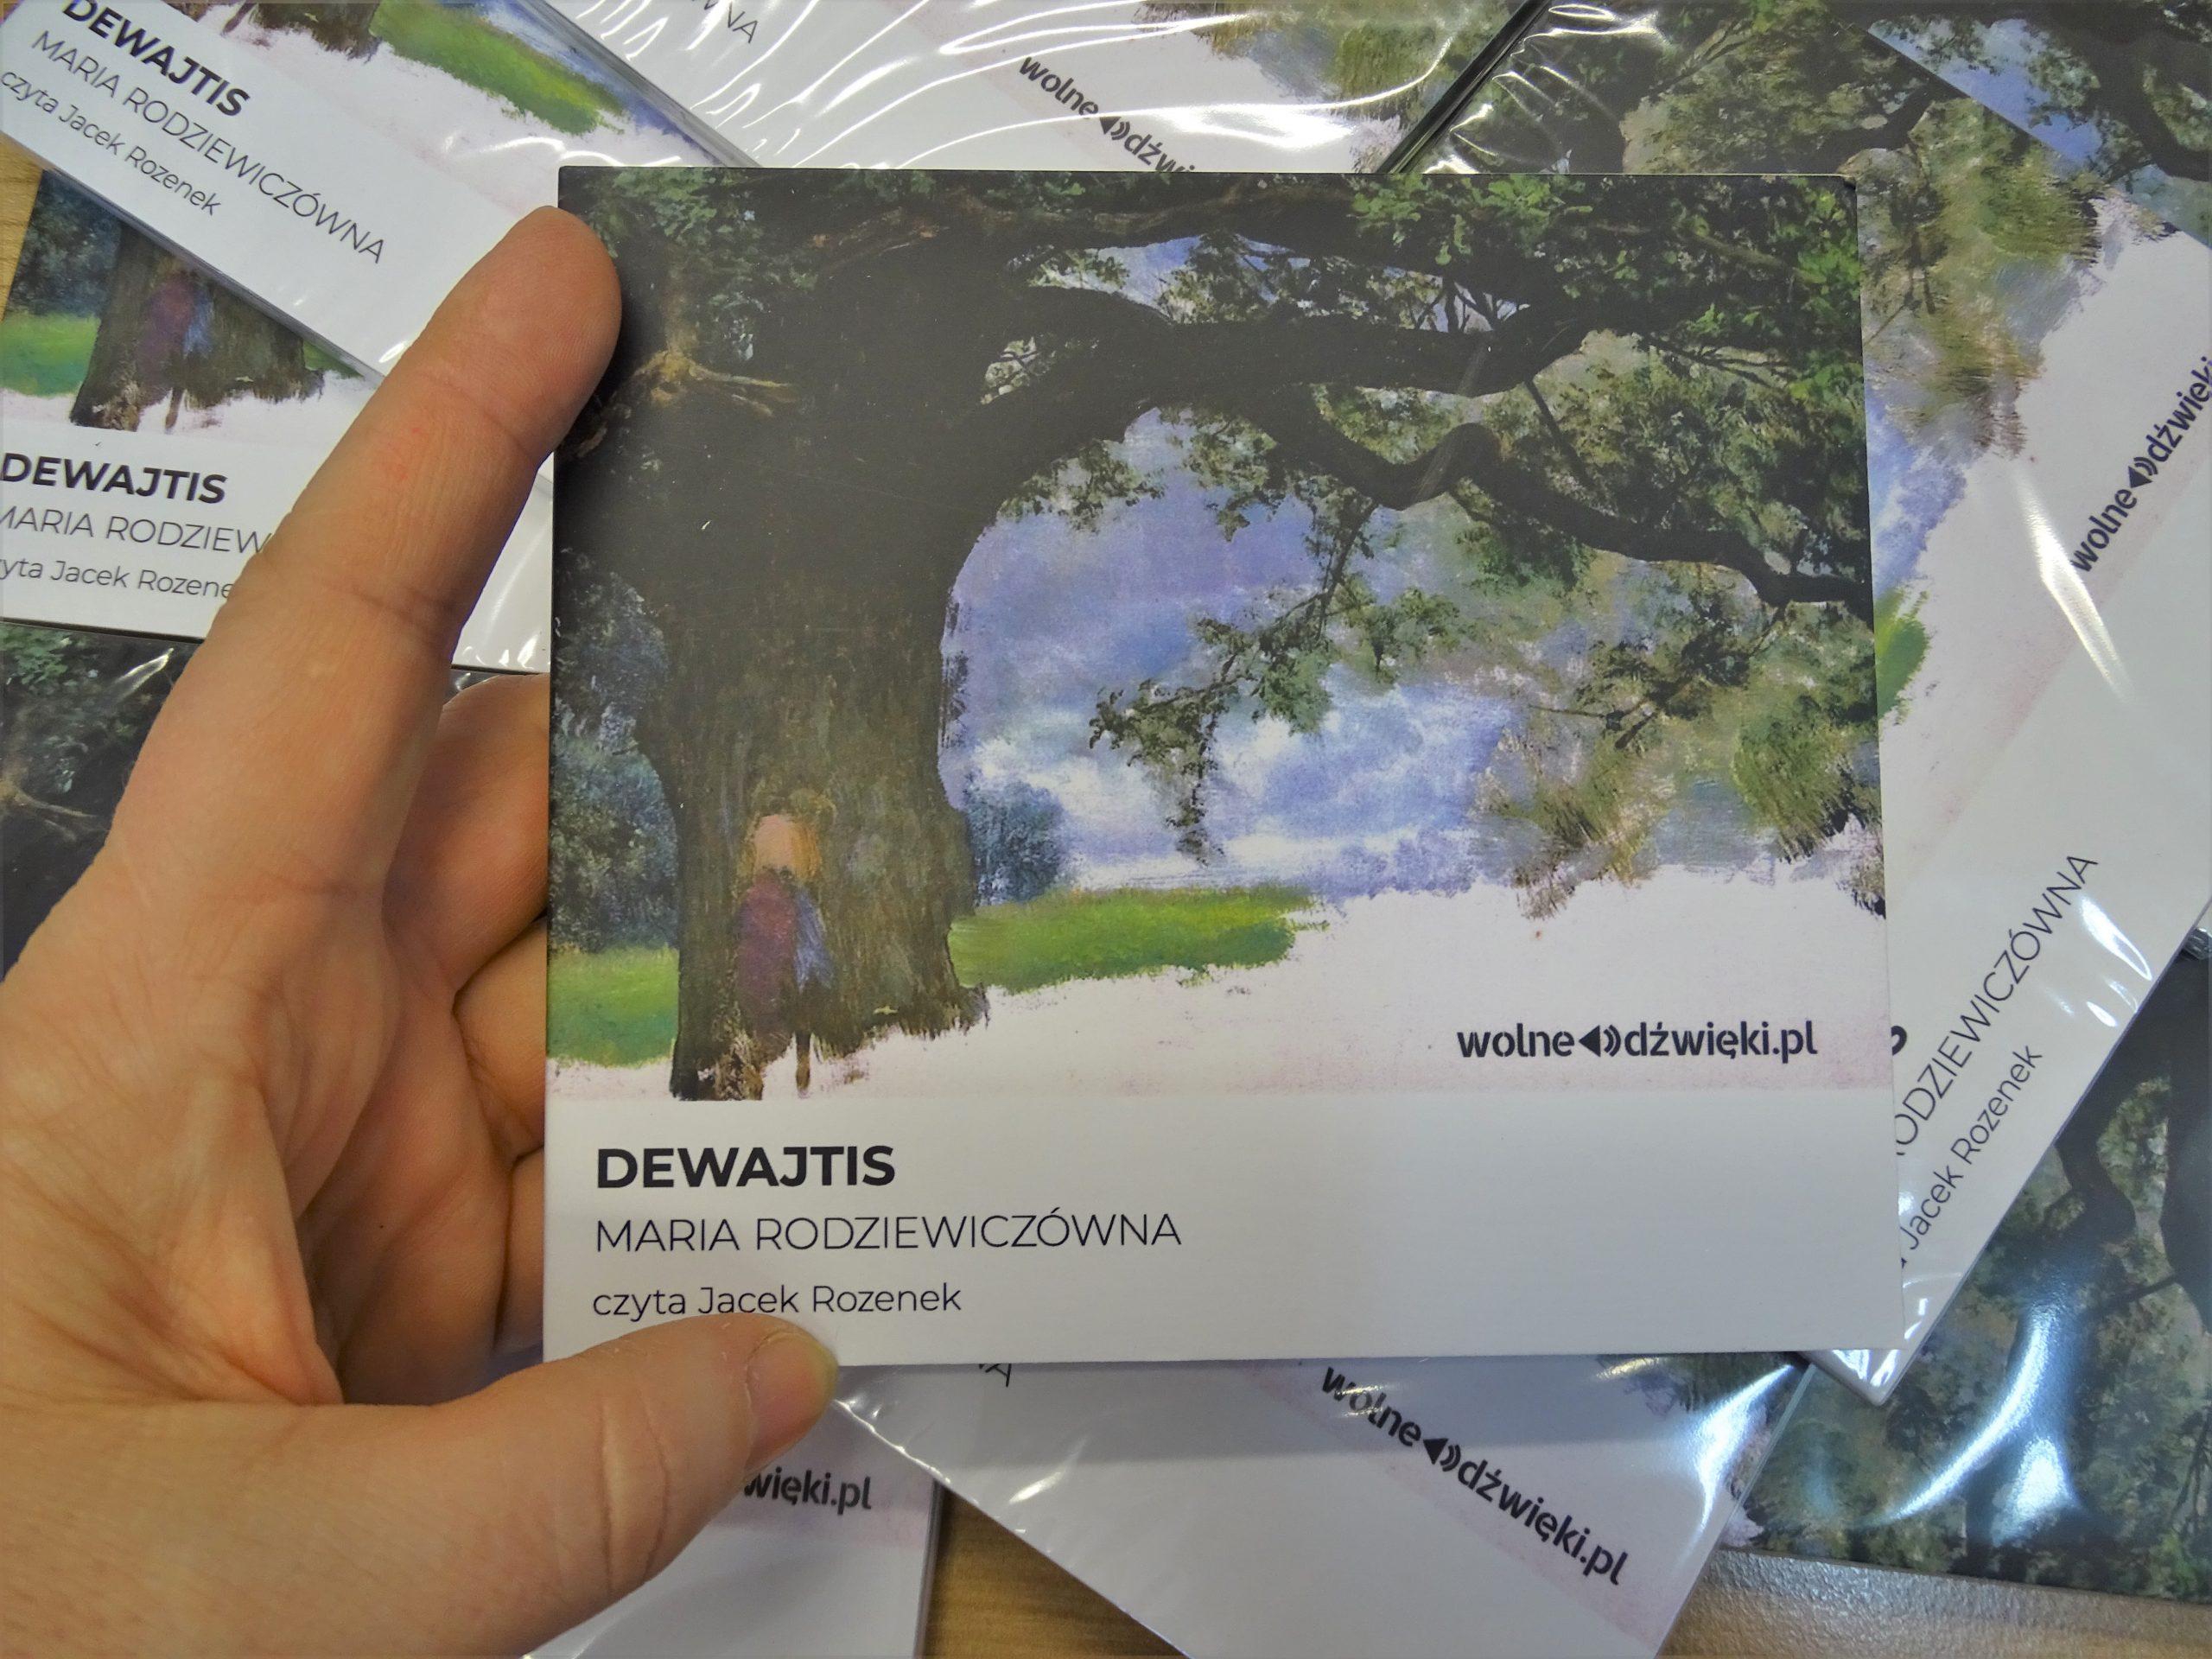 "okładka płyty ""Dewajtis"""